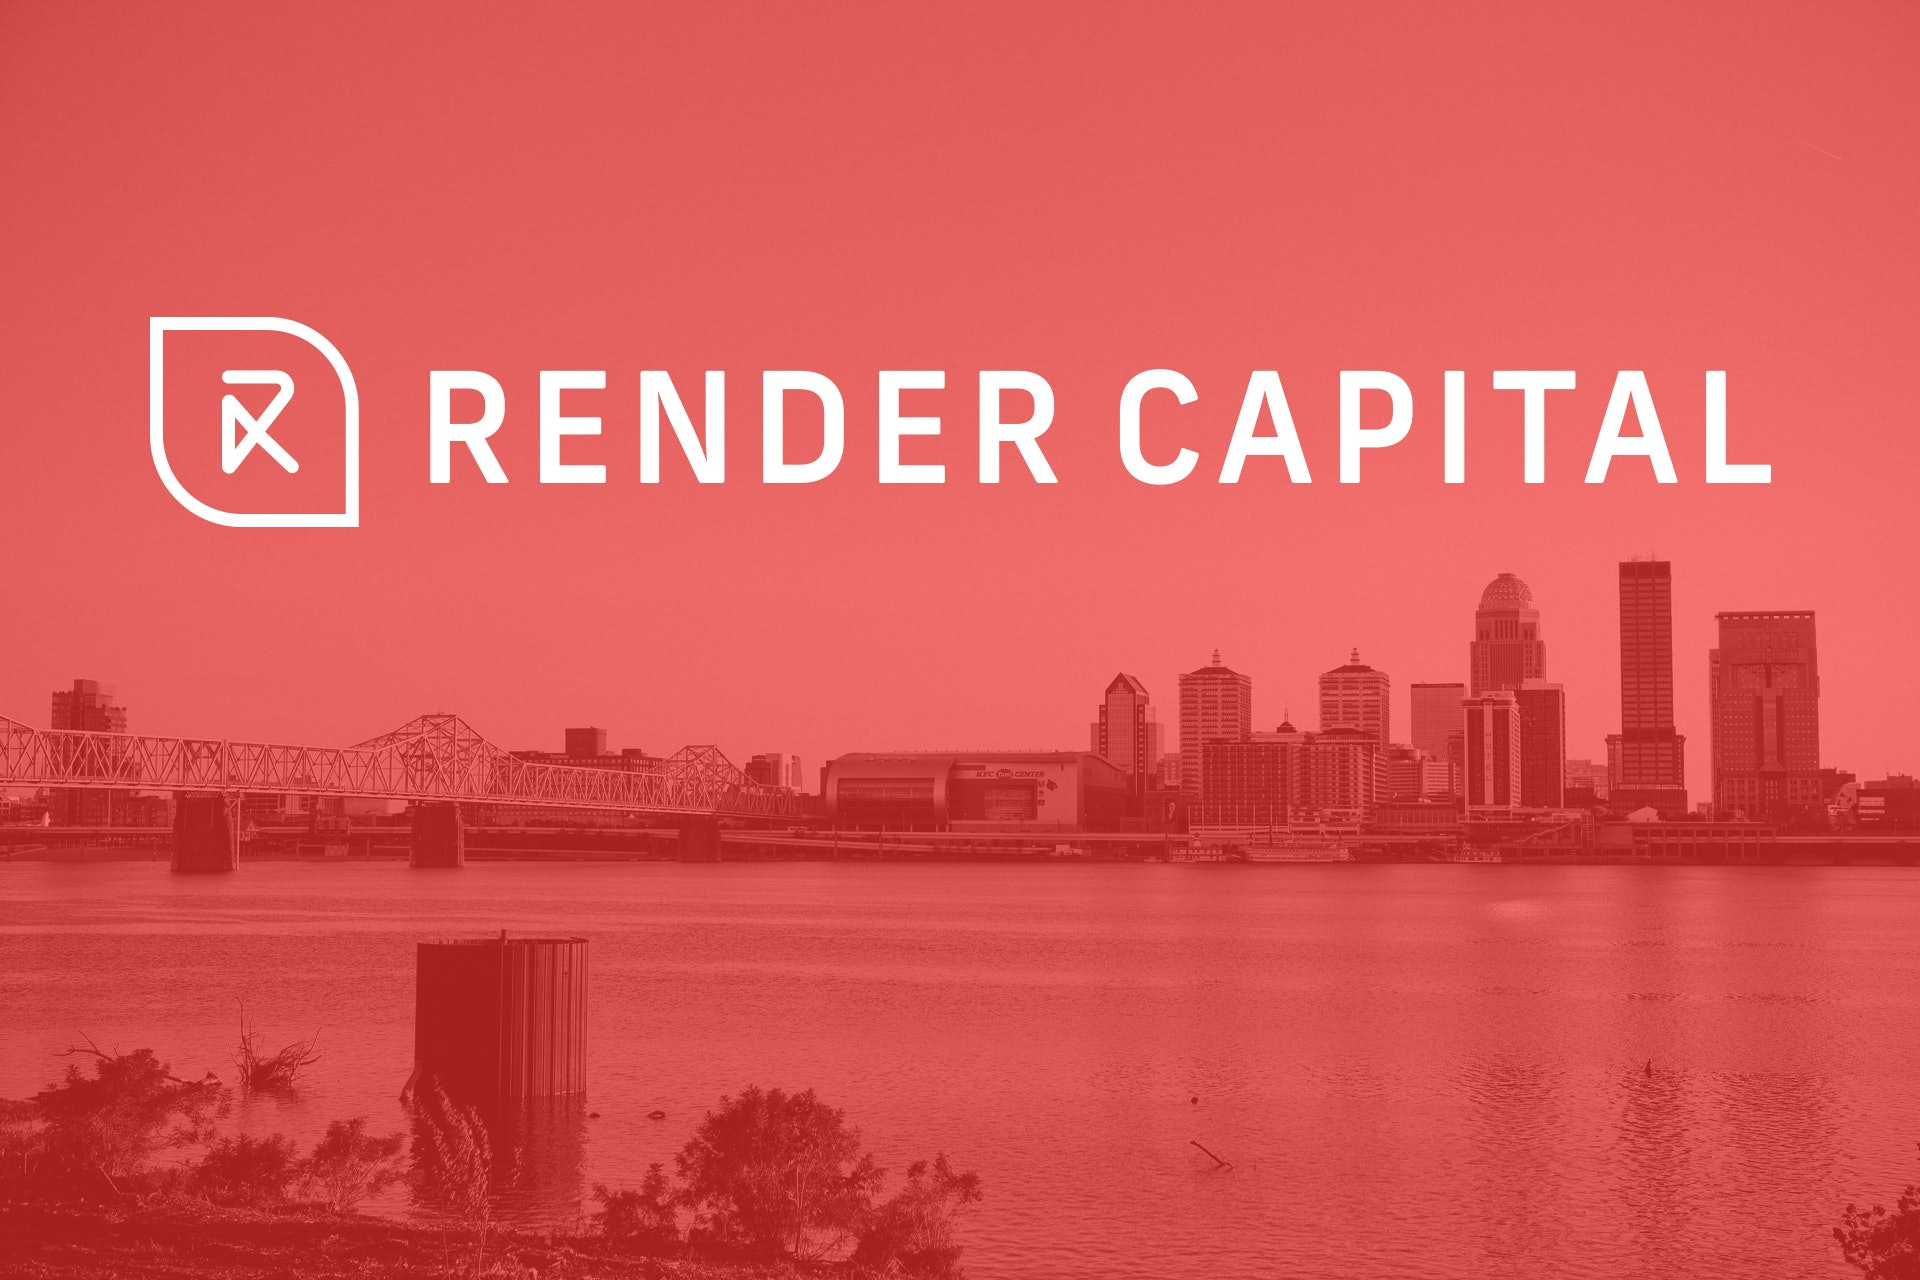 render capital